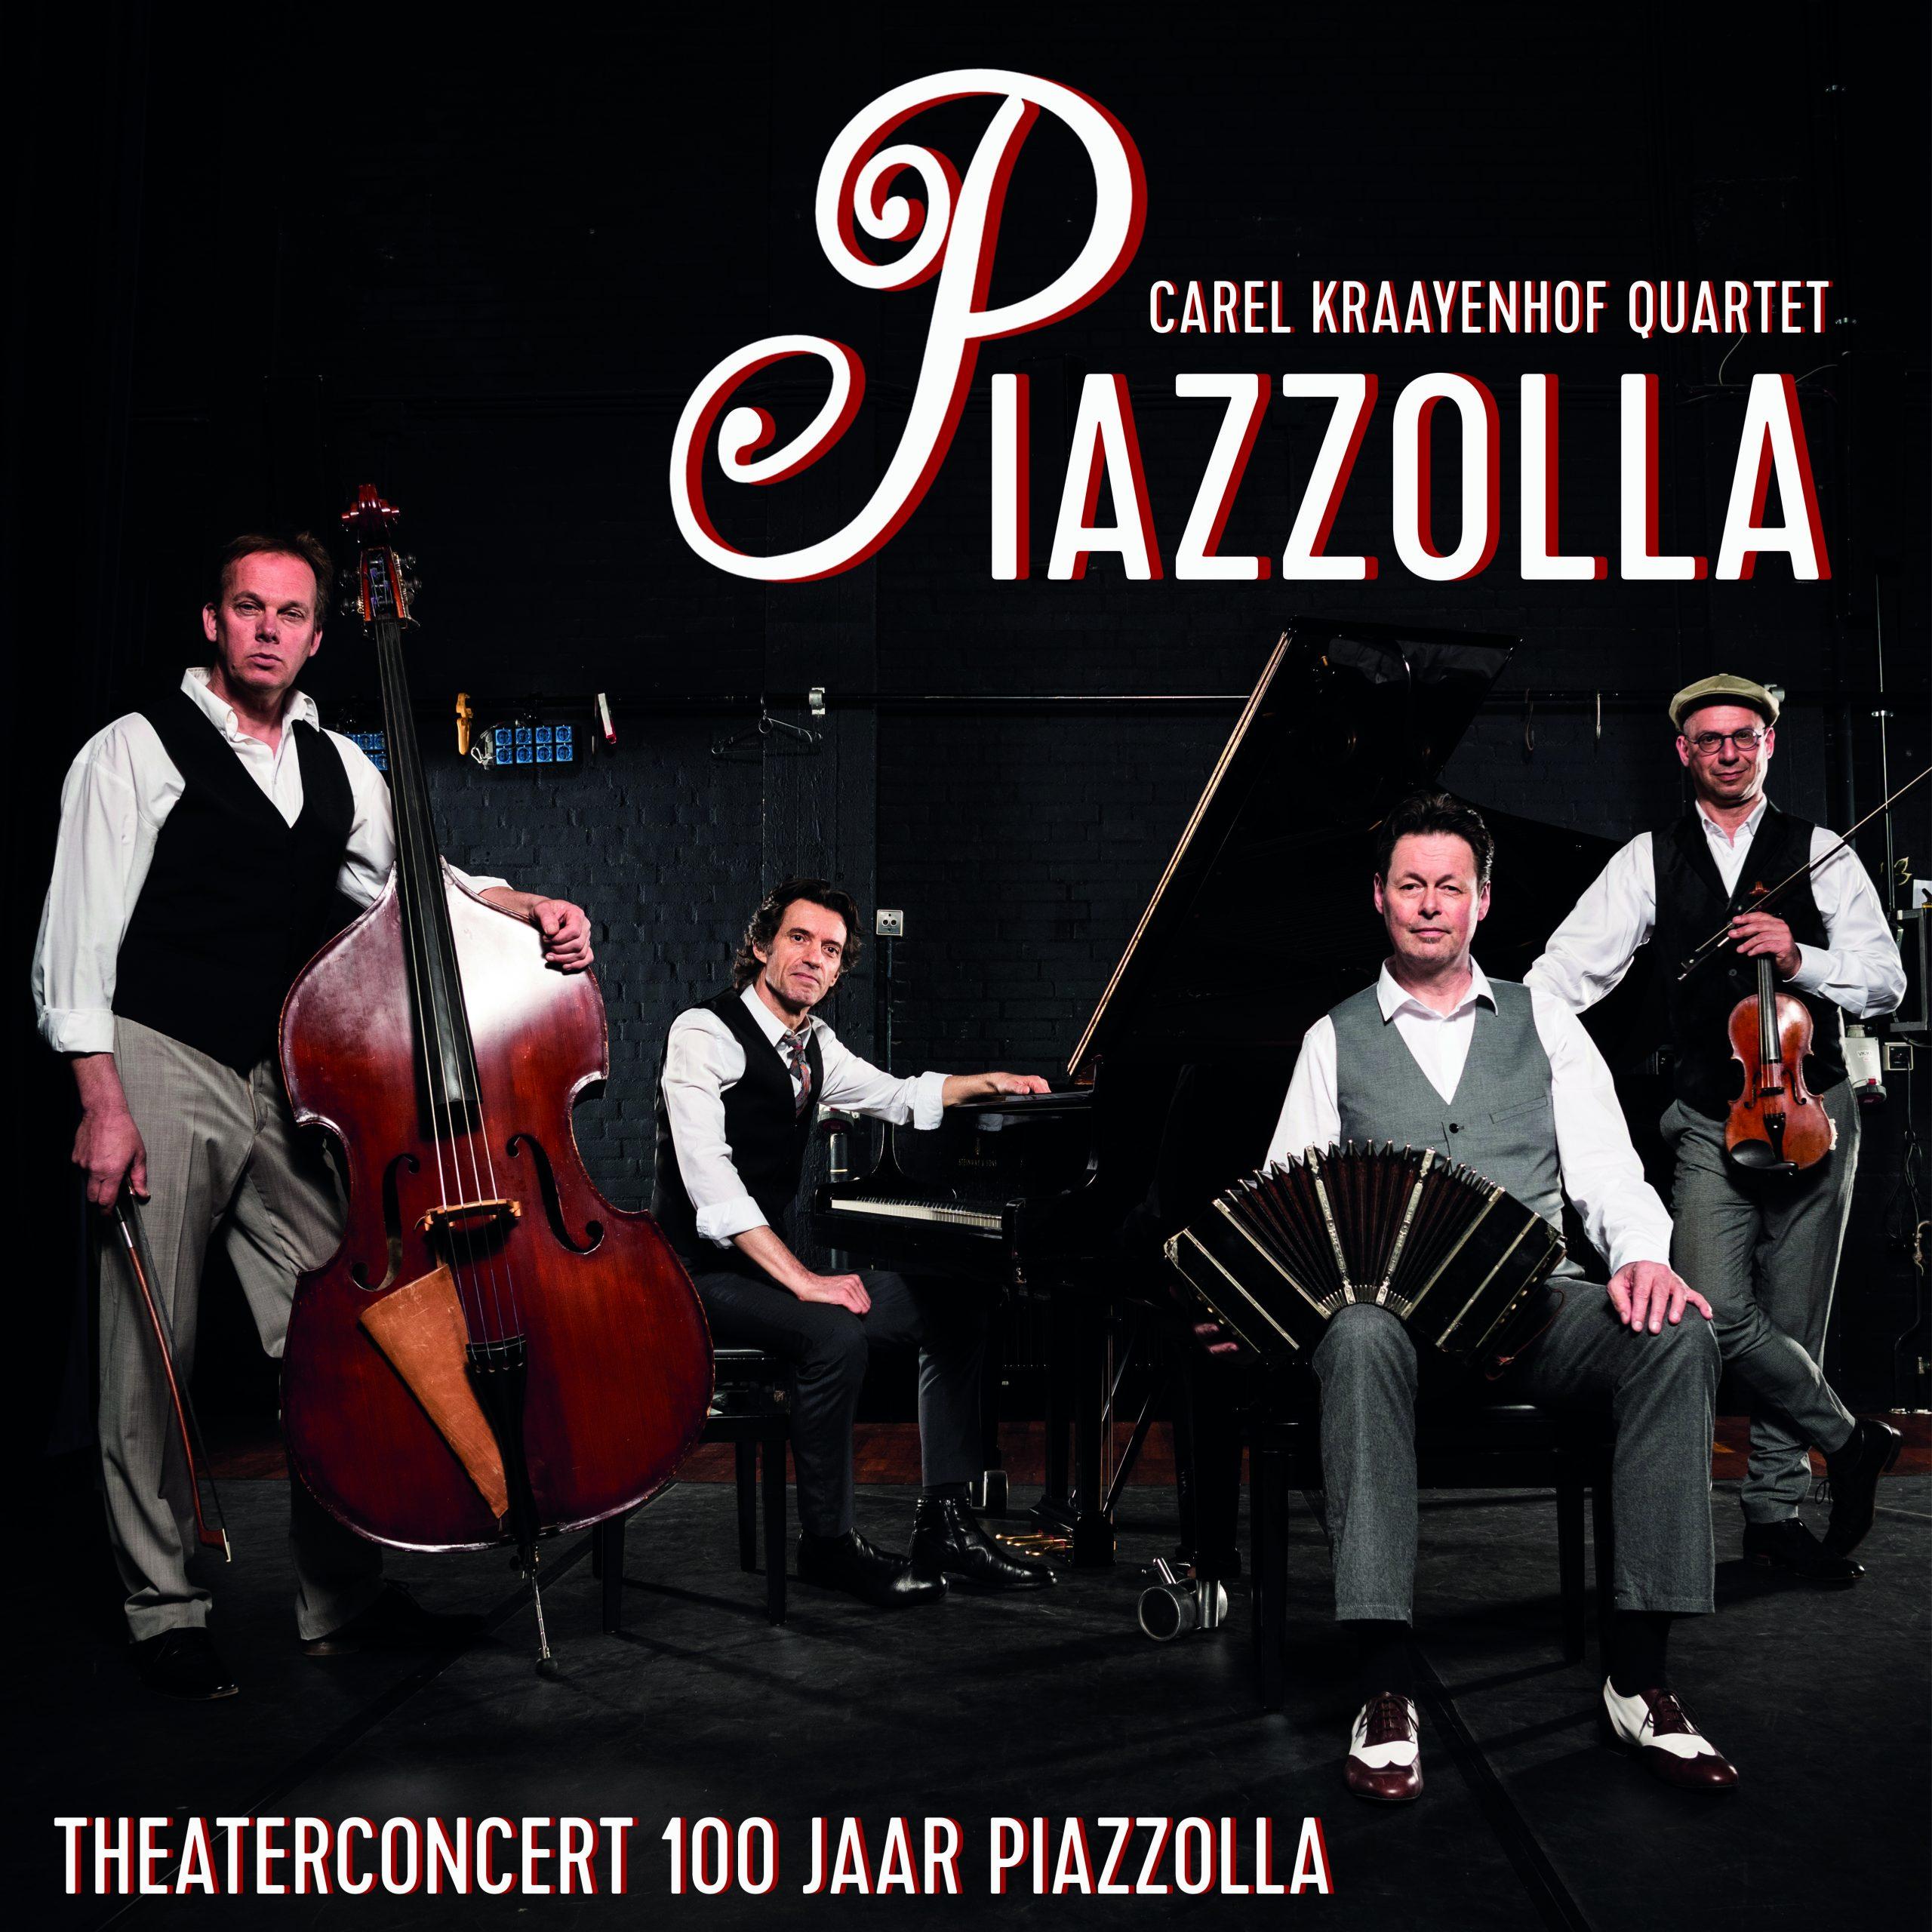 100 jaar Piazzollaa